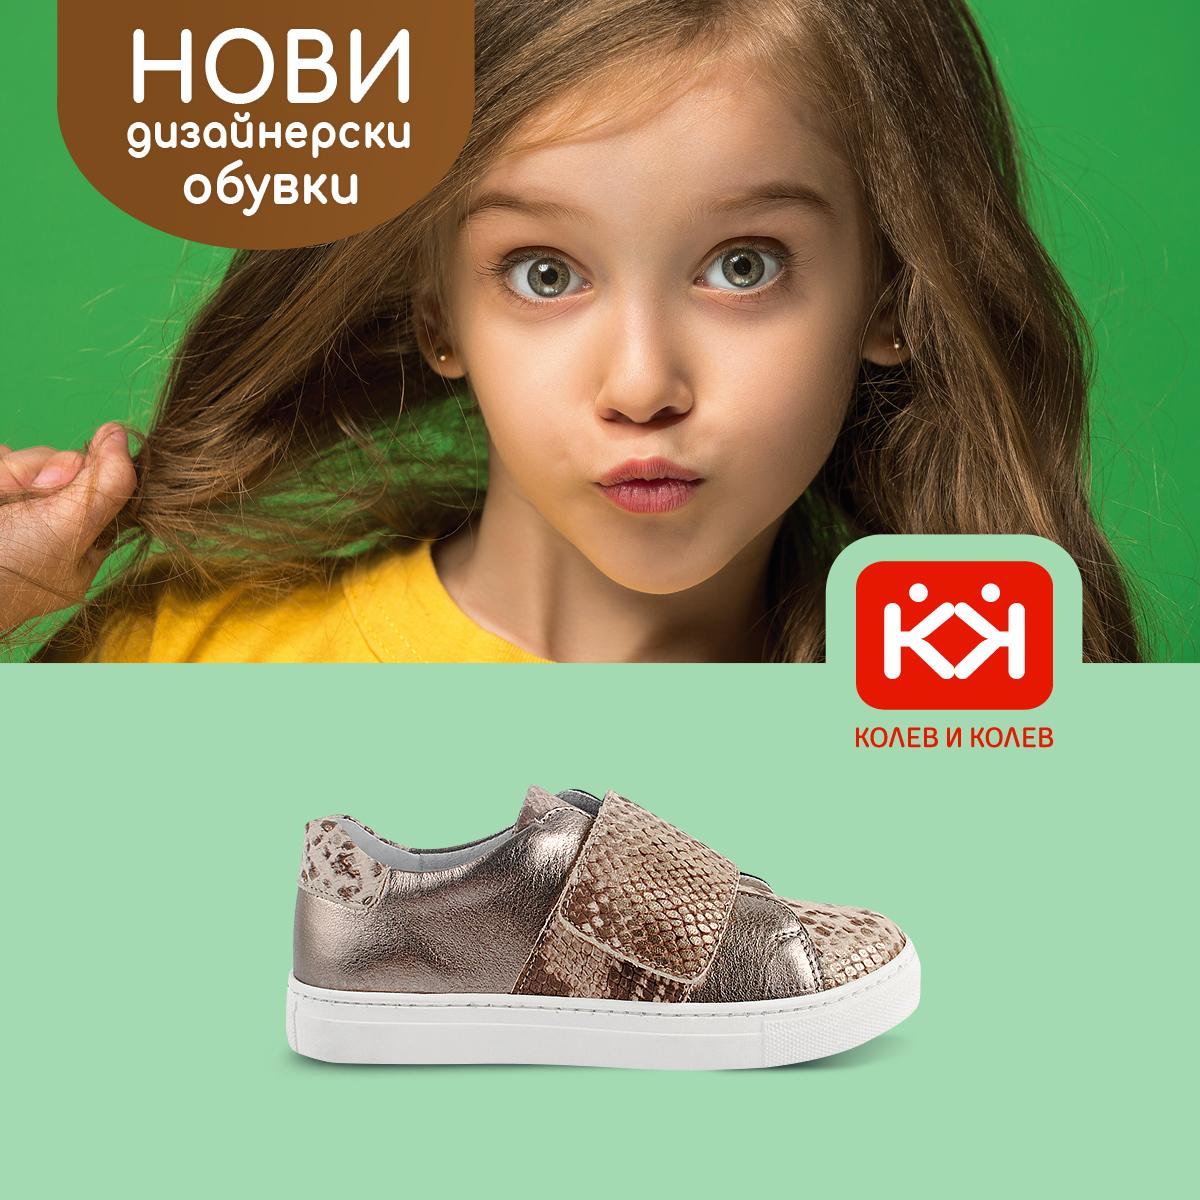 Дизайнерски обувки от Колев и Колев!